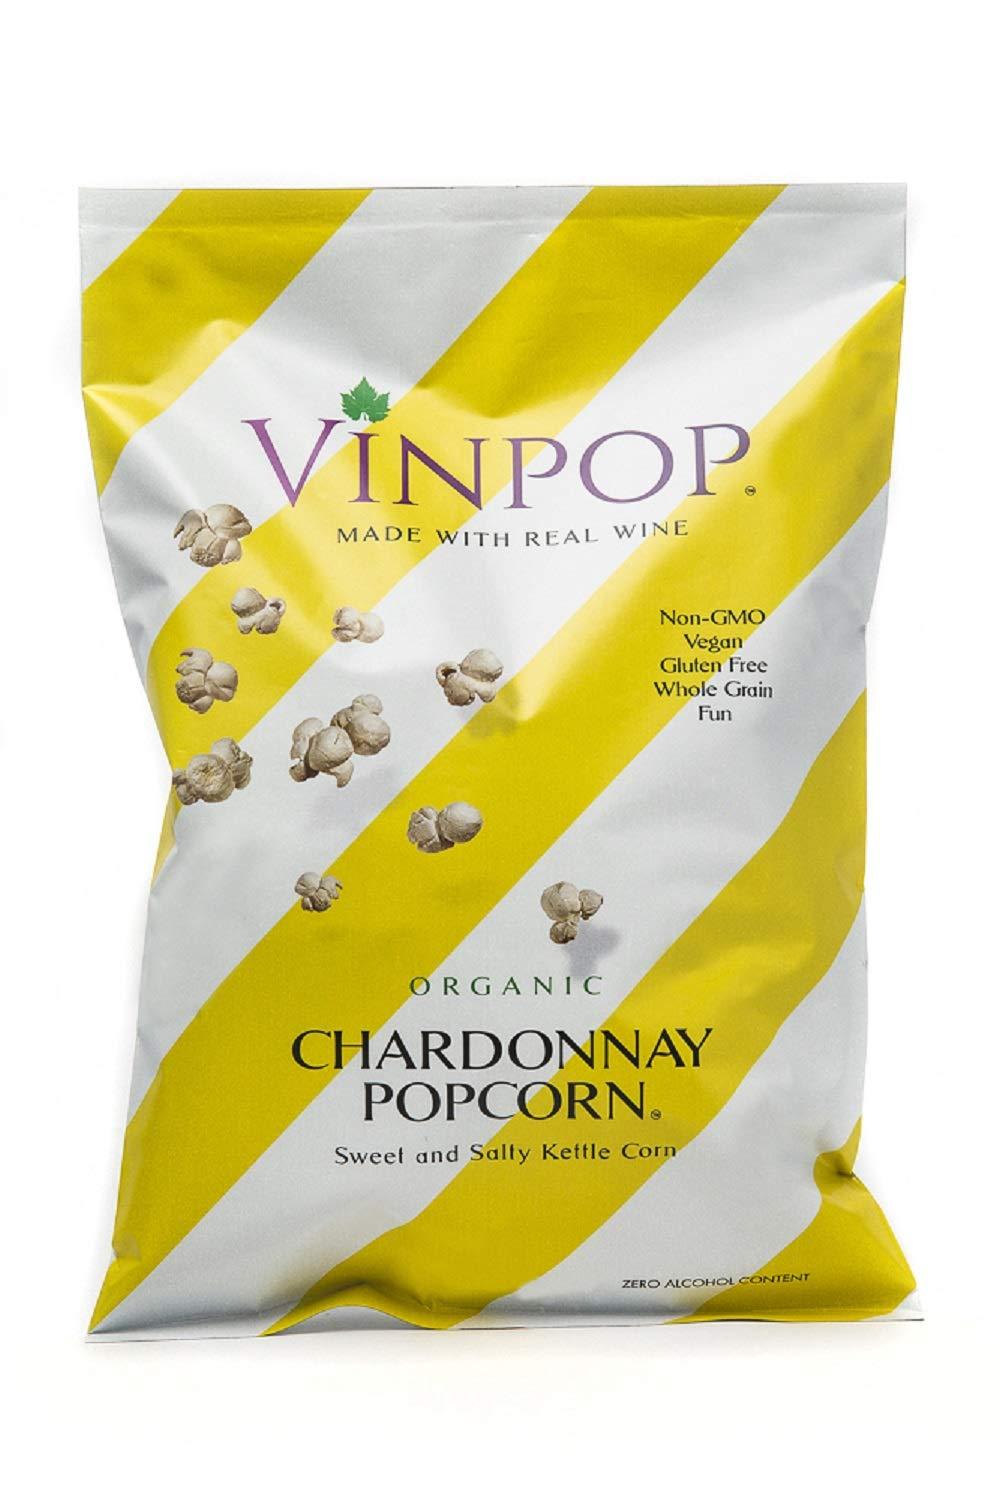 VINPOP Super sale Organic Popcorn - Spasm price Chardonnay 2 Pack Ounce Bag Made 12